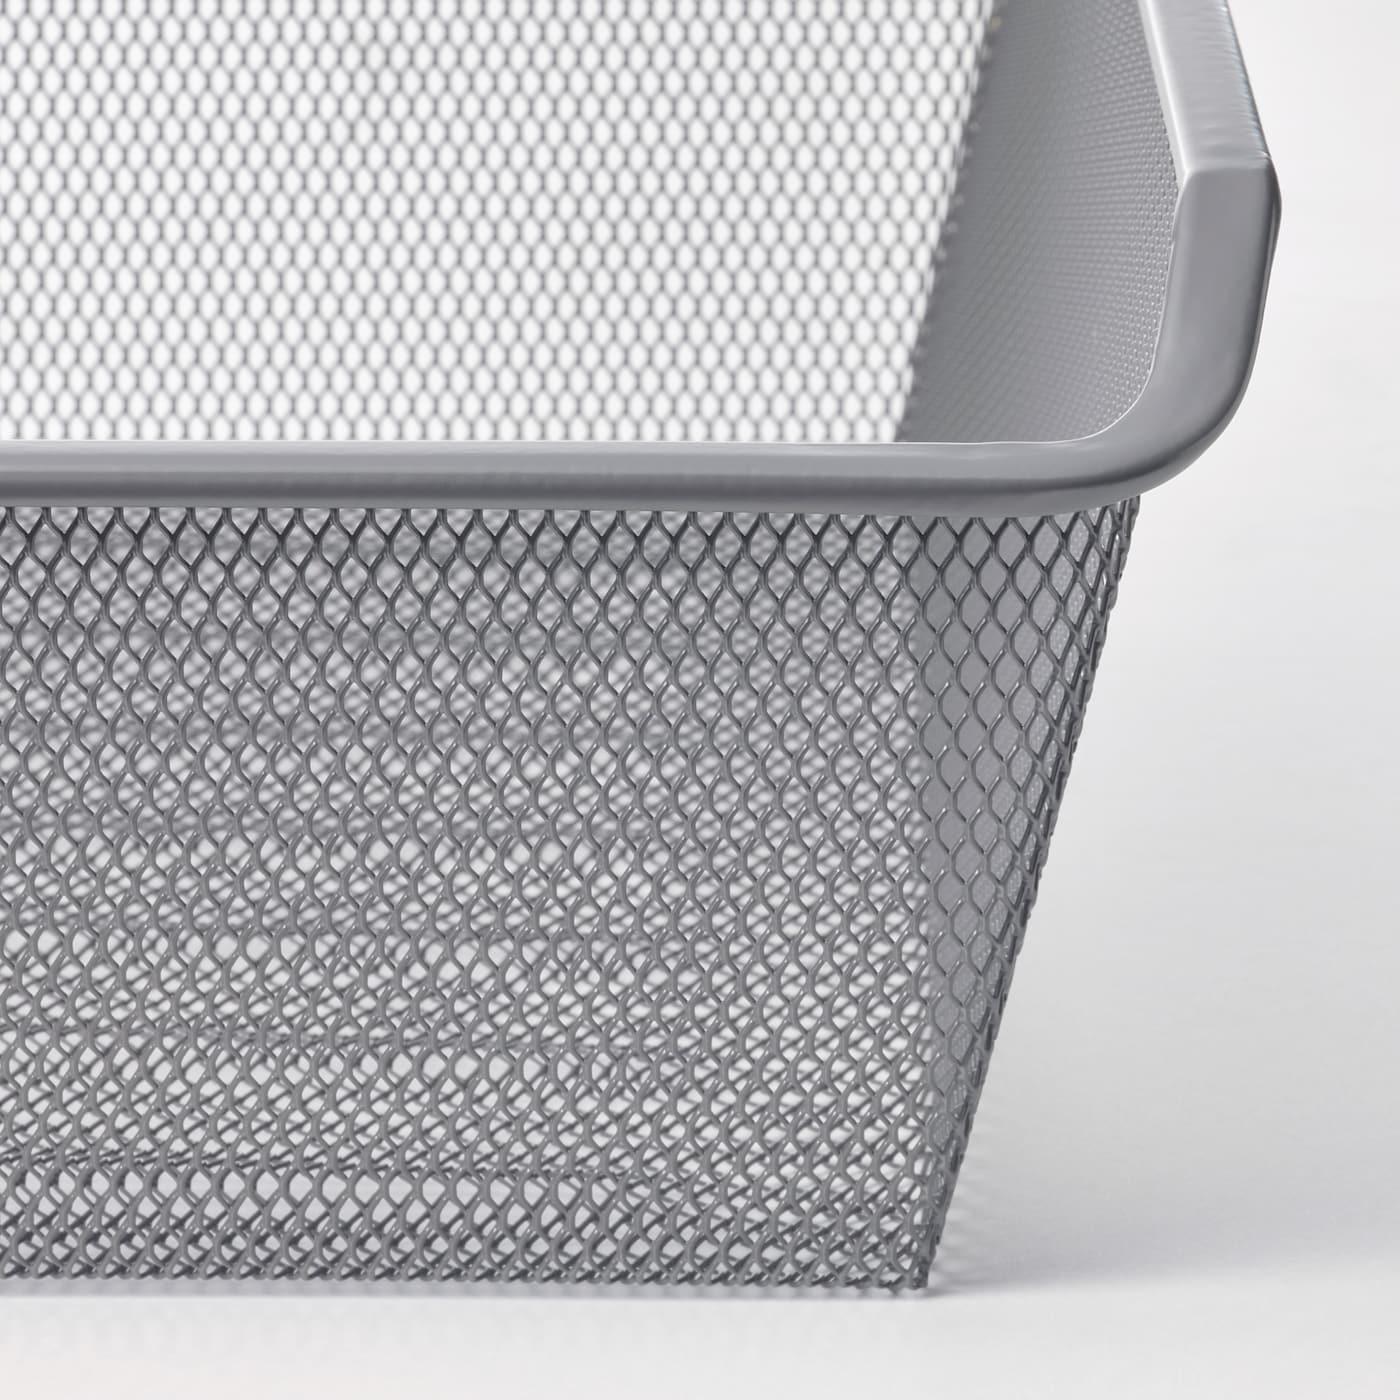 KOMPLEMENT سلة شبكية مع مجرى سحب, رمادي غامق, 50x58 سم